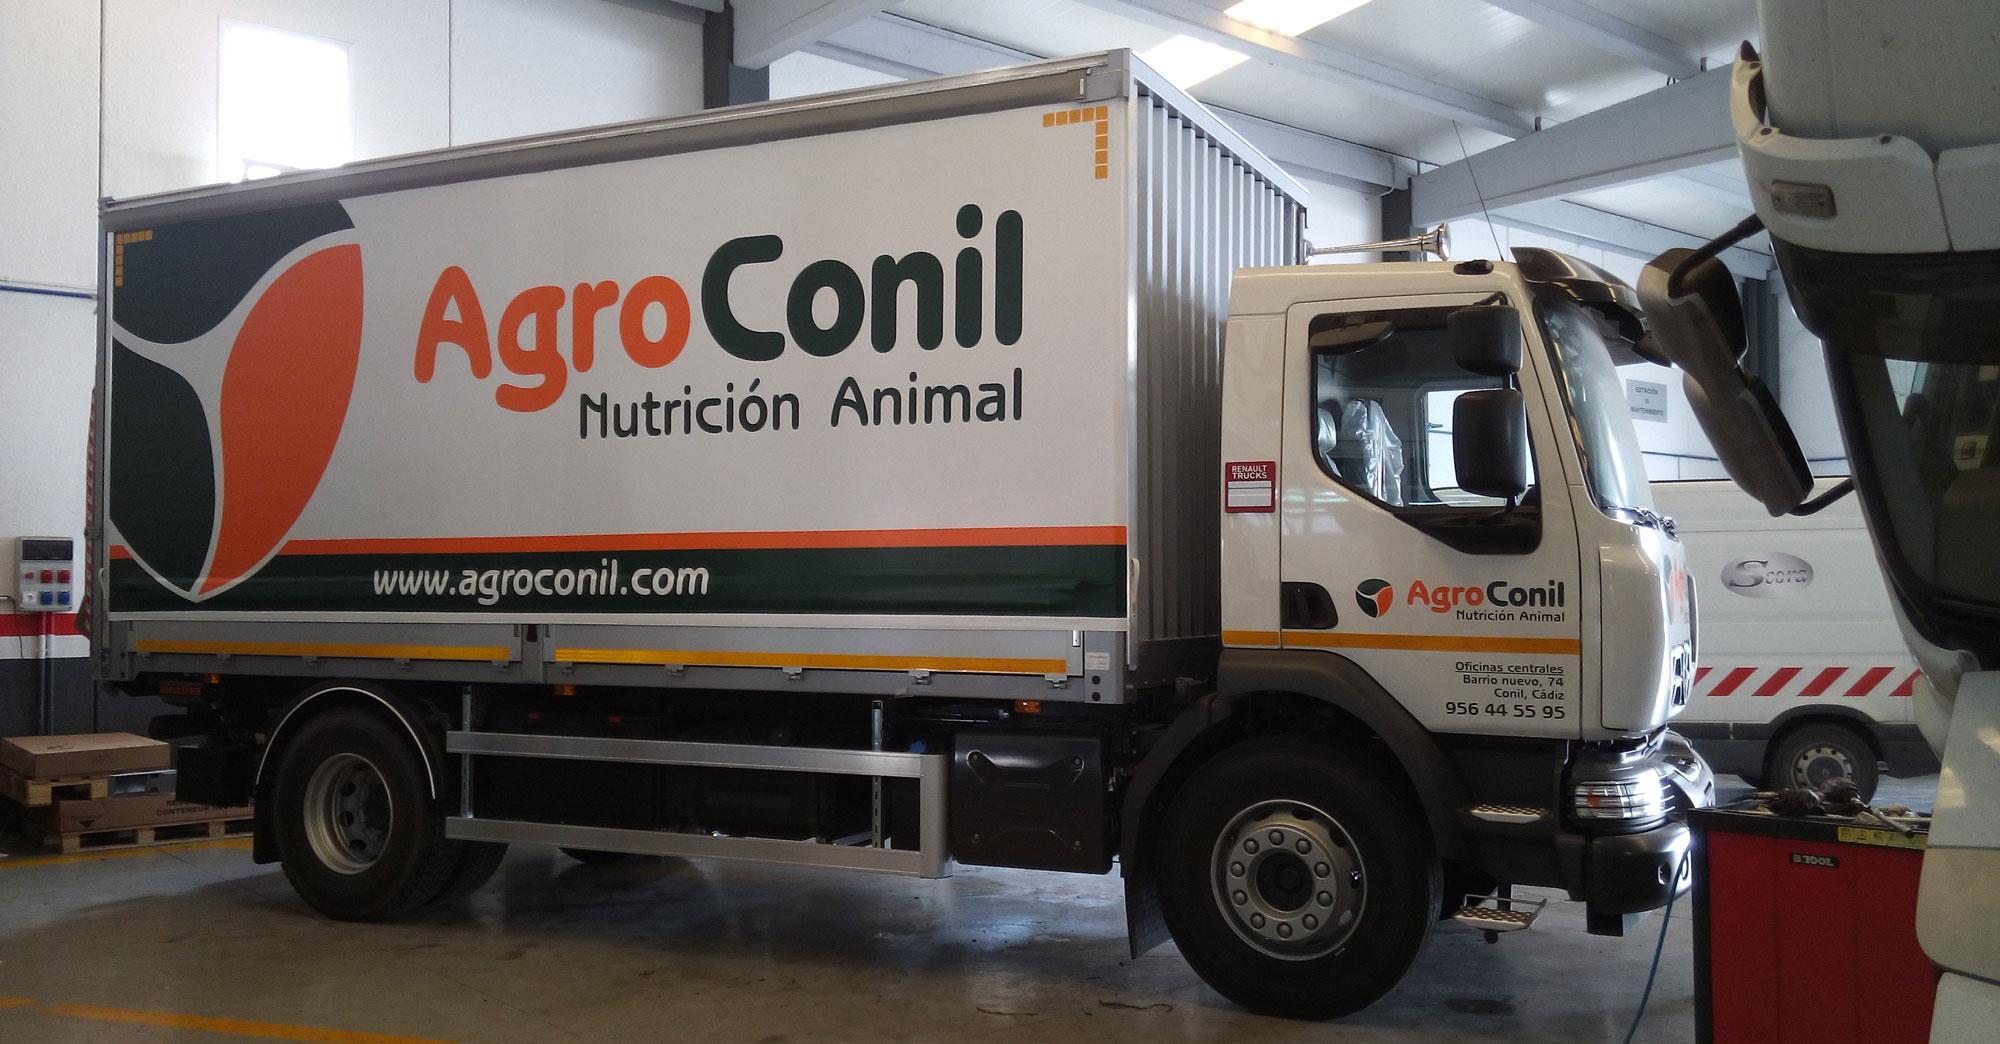 Agroconil truck